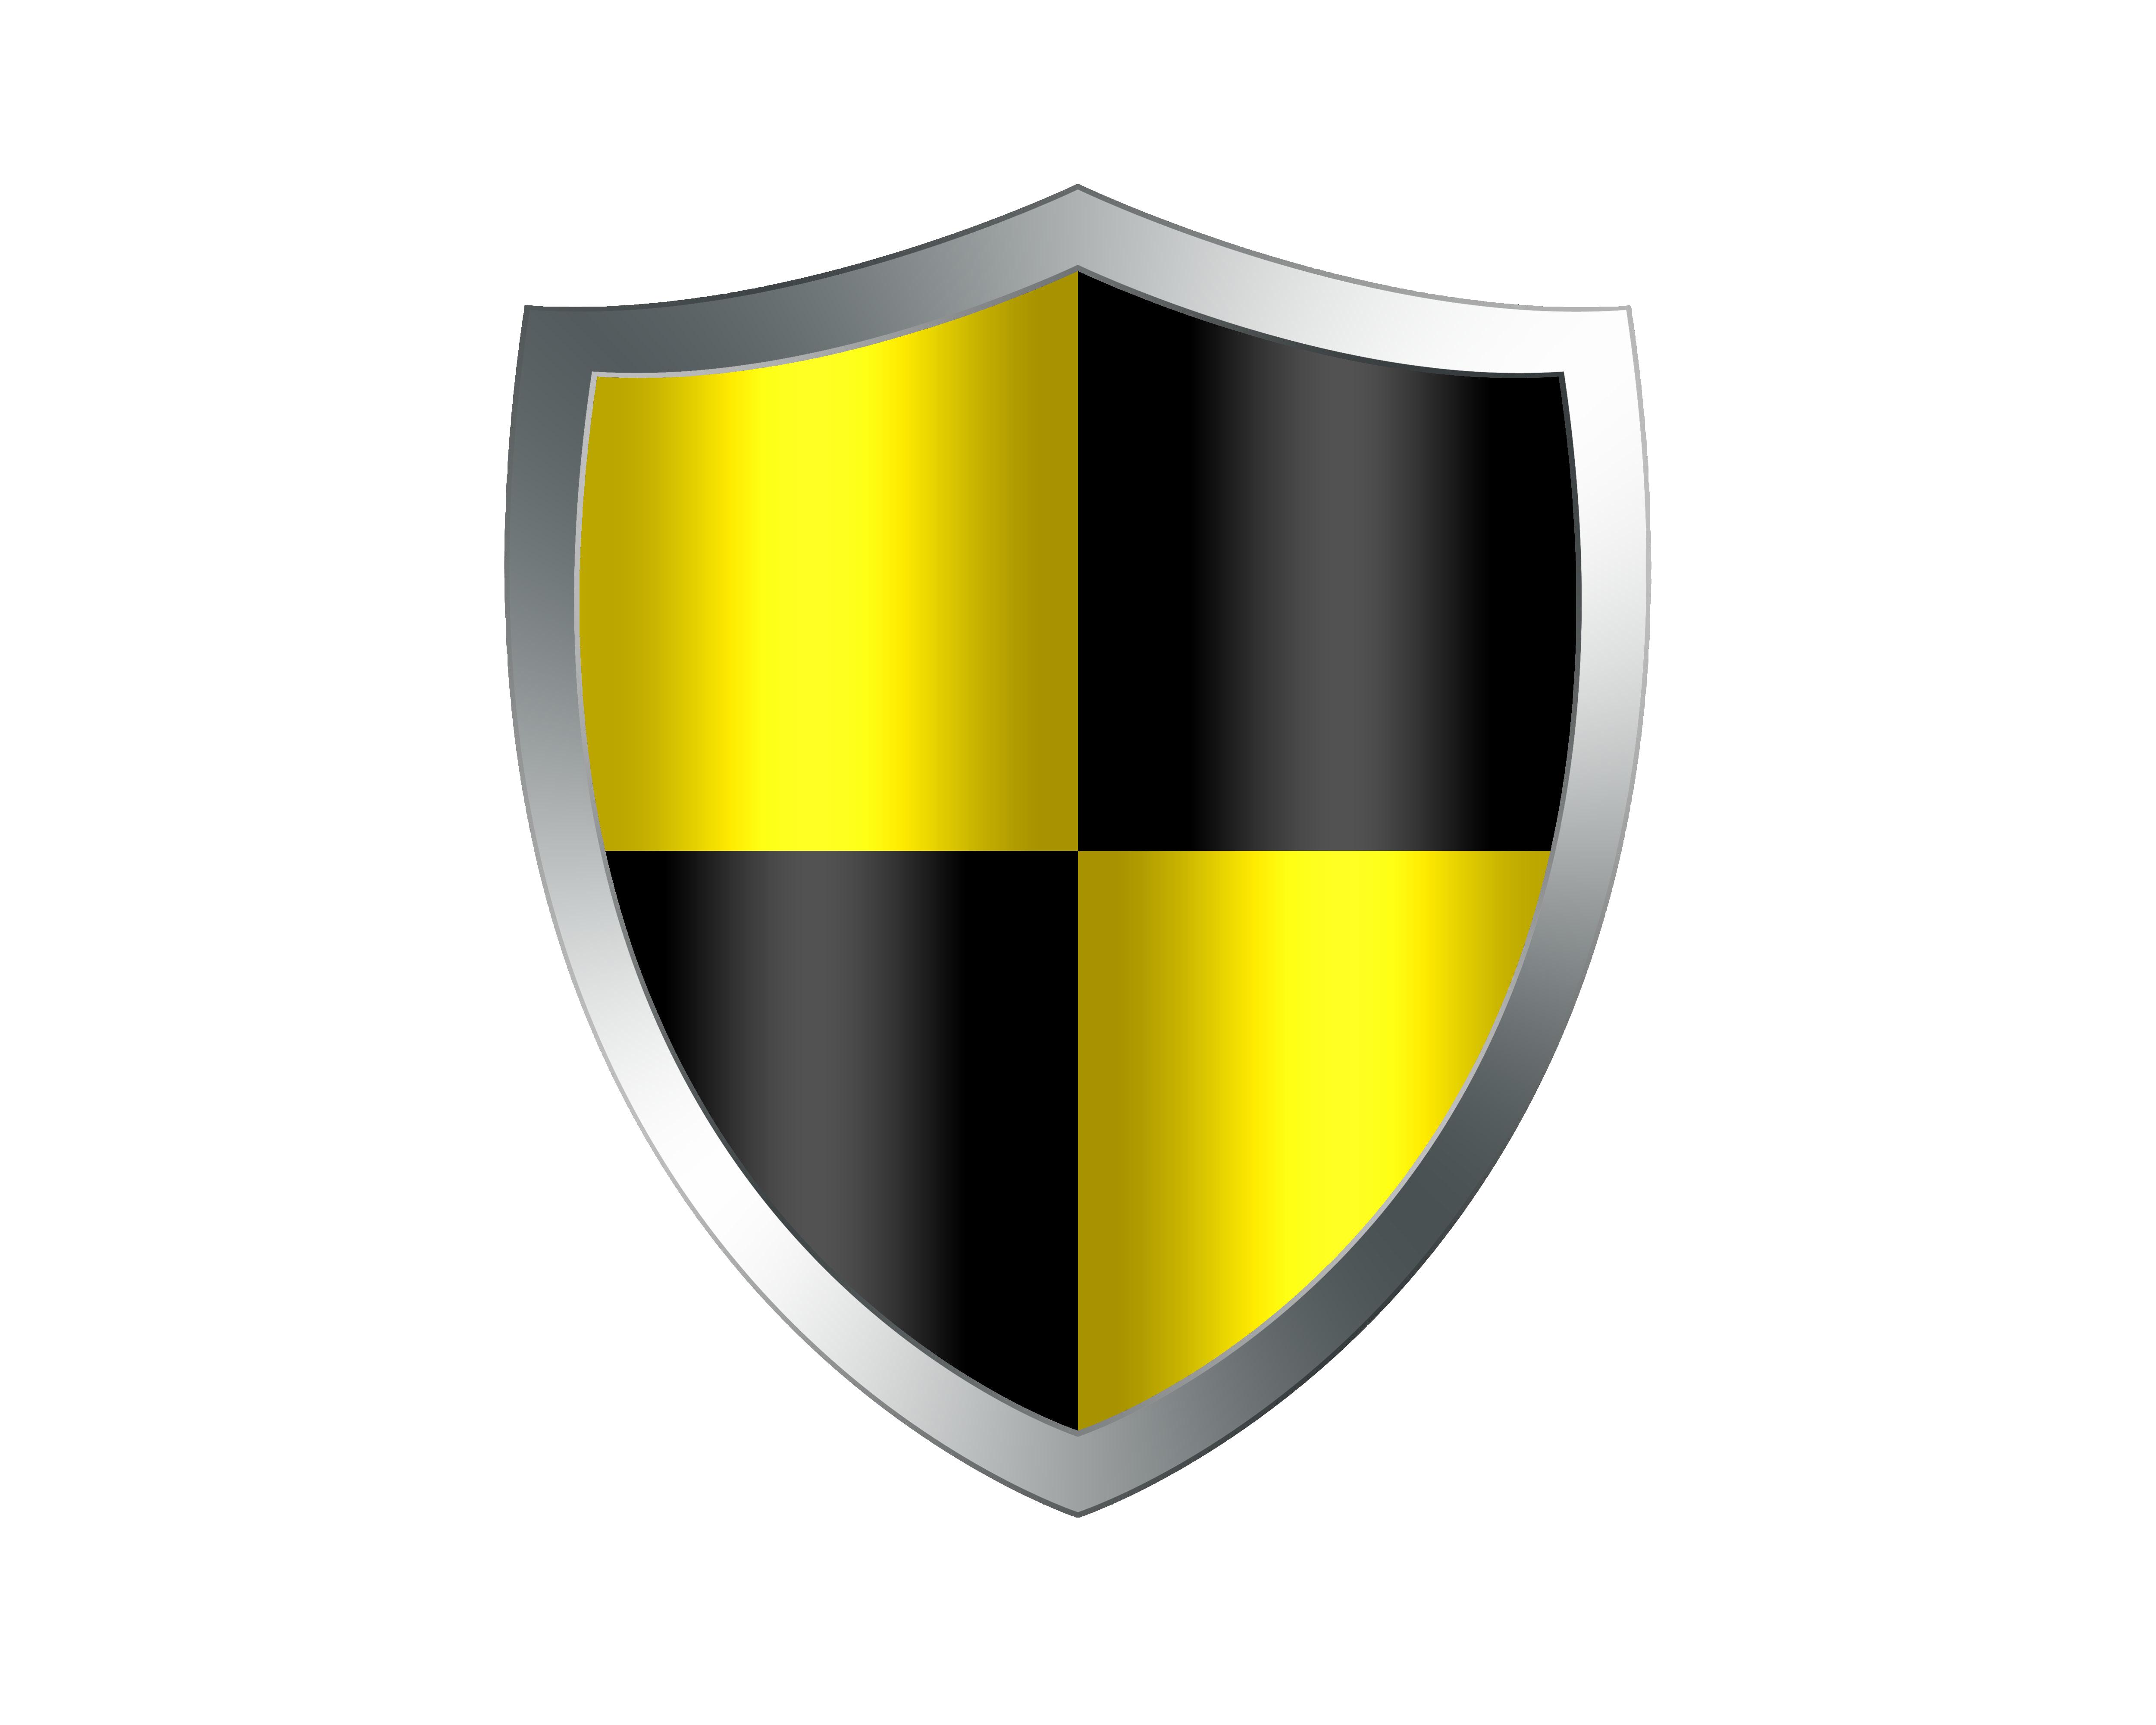 Silver Shield PNG Image - PurePNG | Free transparent CC0 ...